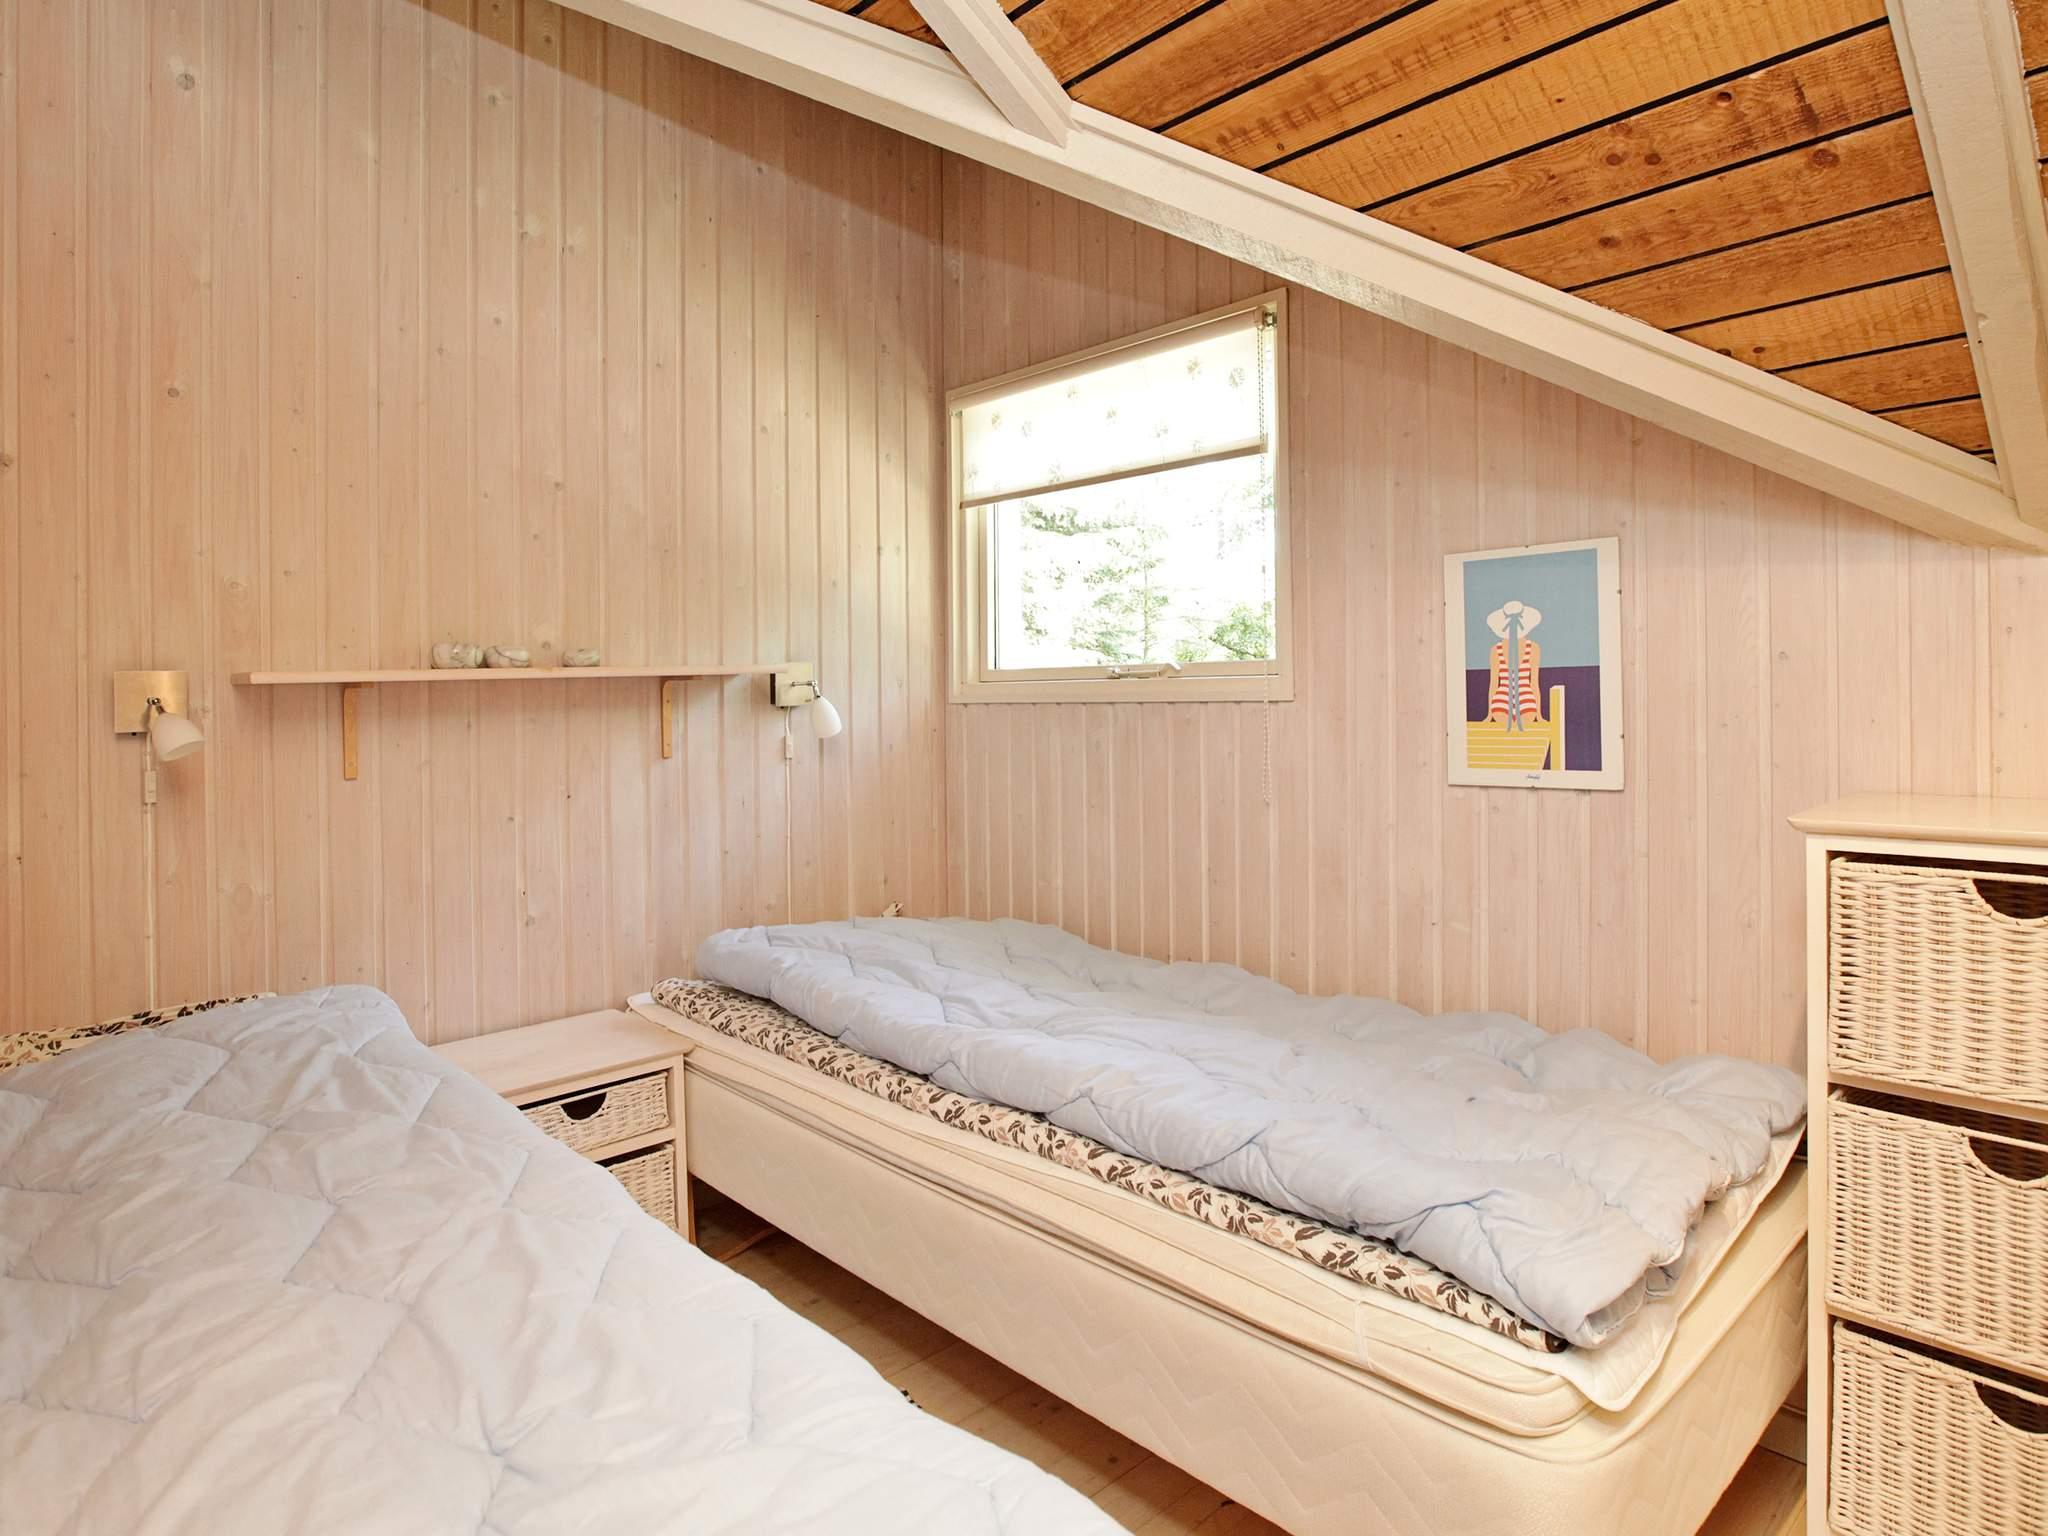 Ferienhaus Ristinge (82427), Ristinge, , Langeland, Dänemark, Bild 9